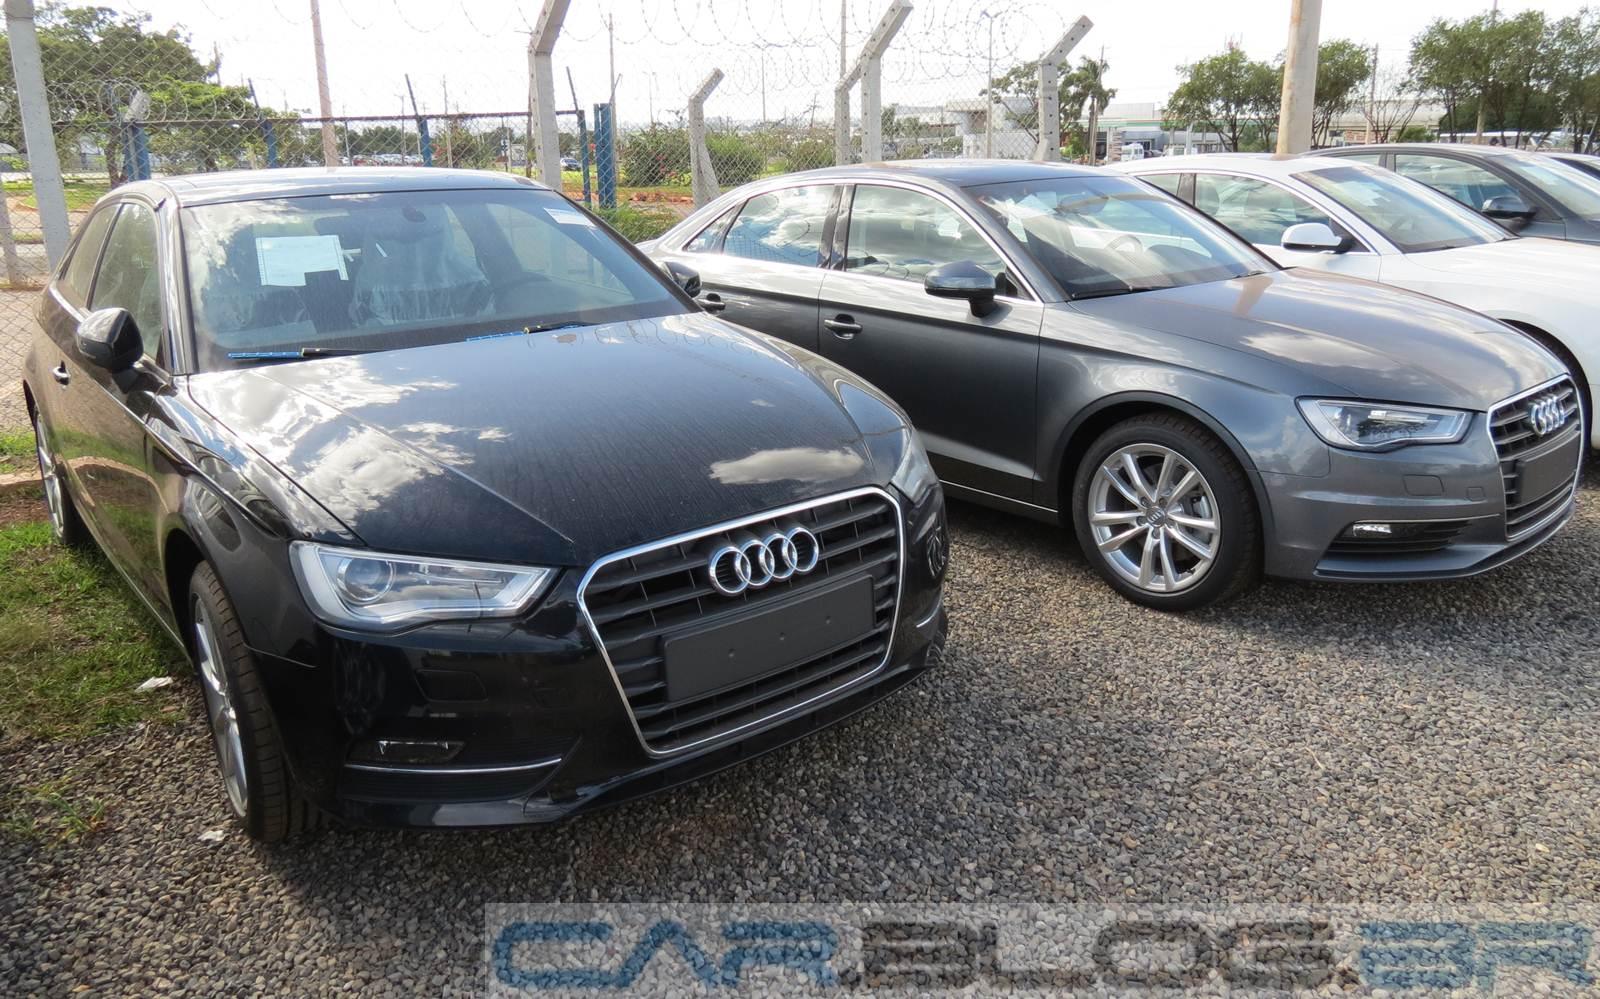 Audi A3 Hatch (esquerda) x Audi A3 Sedan (direita)